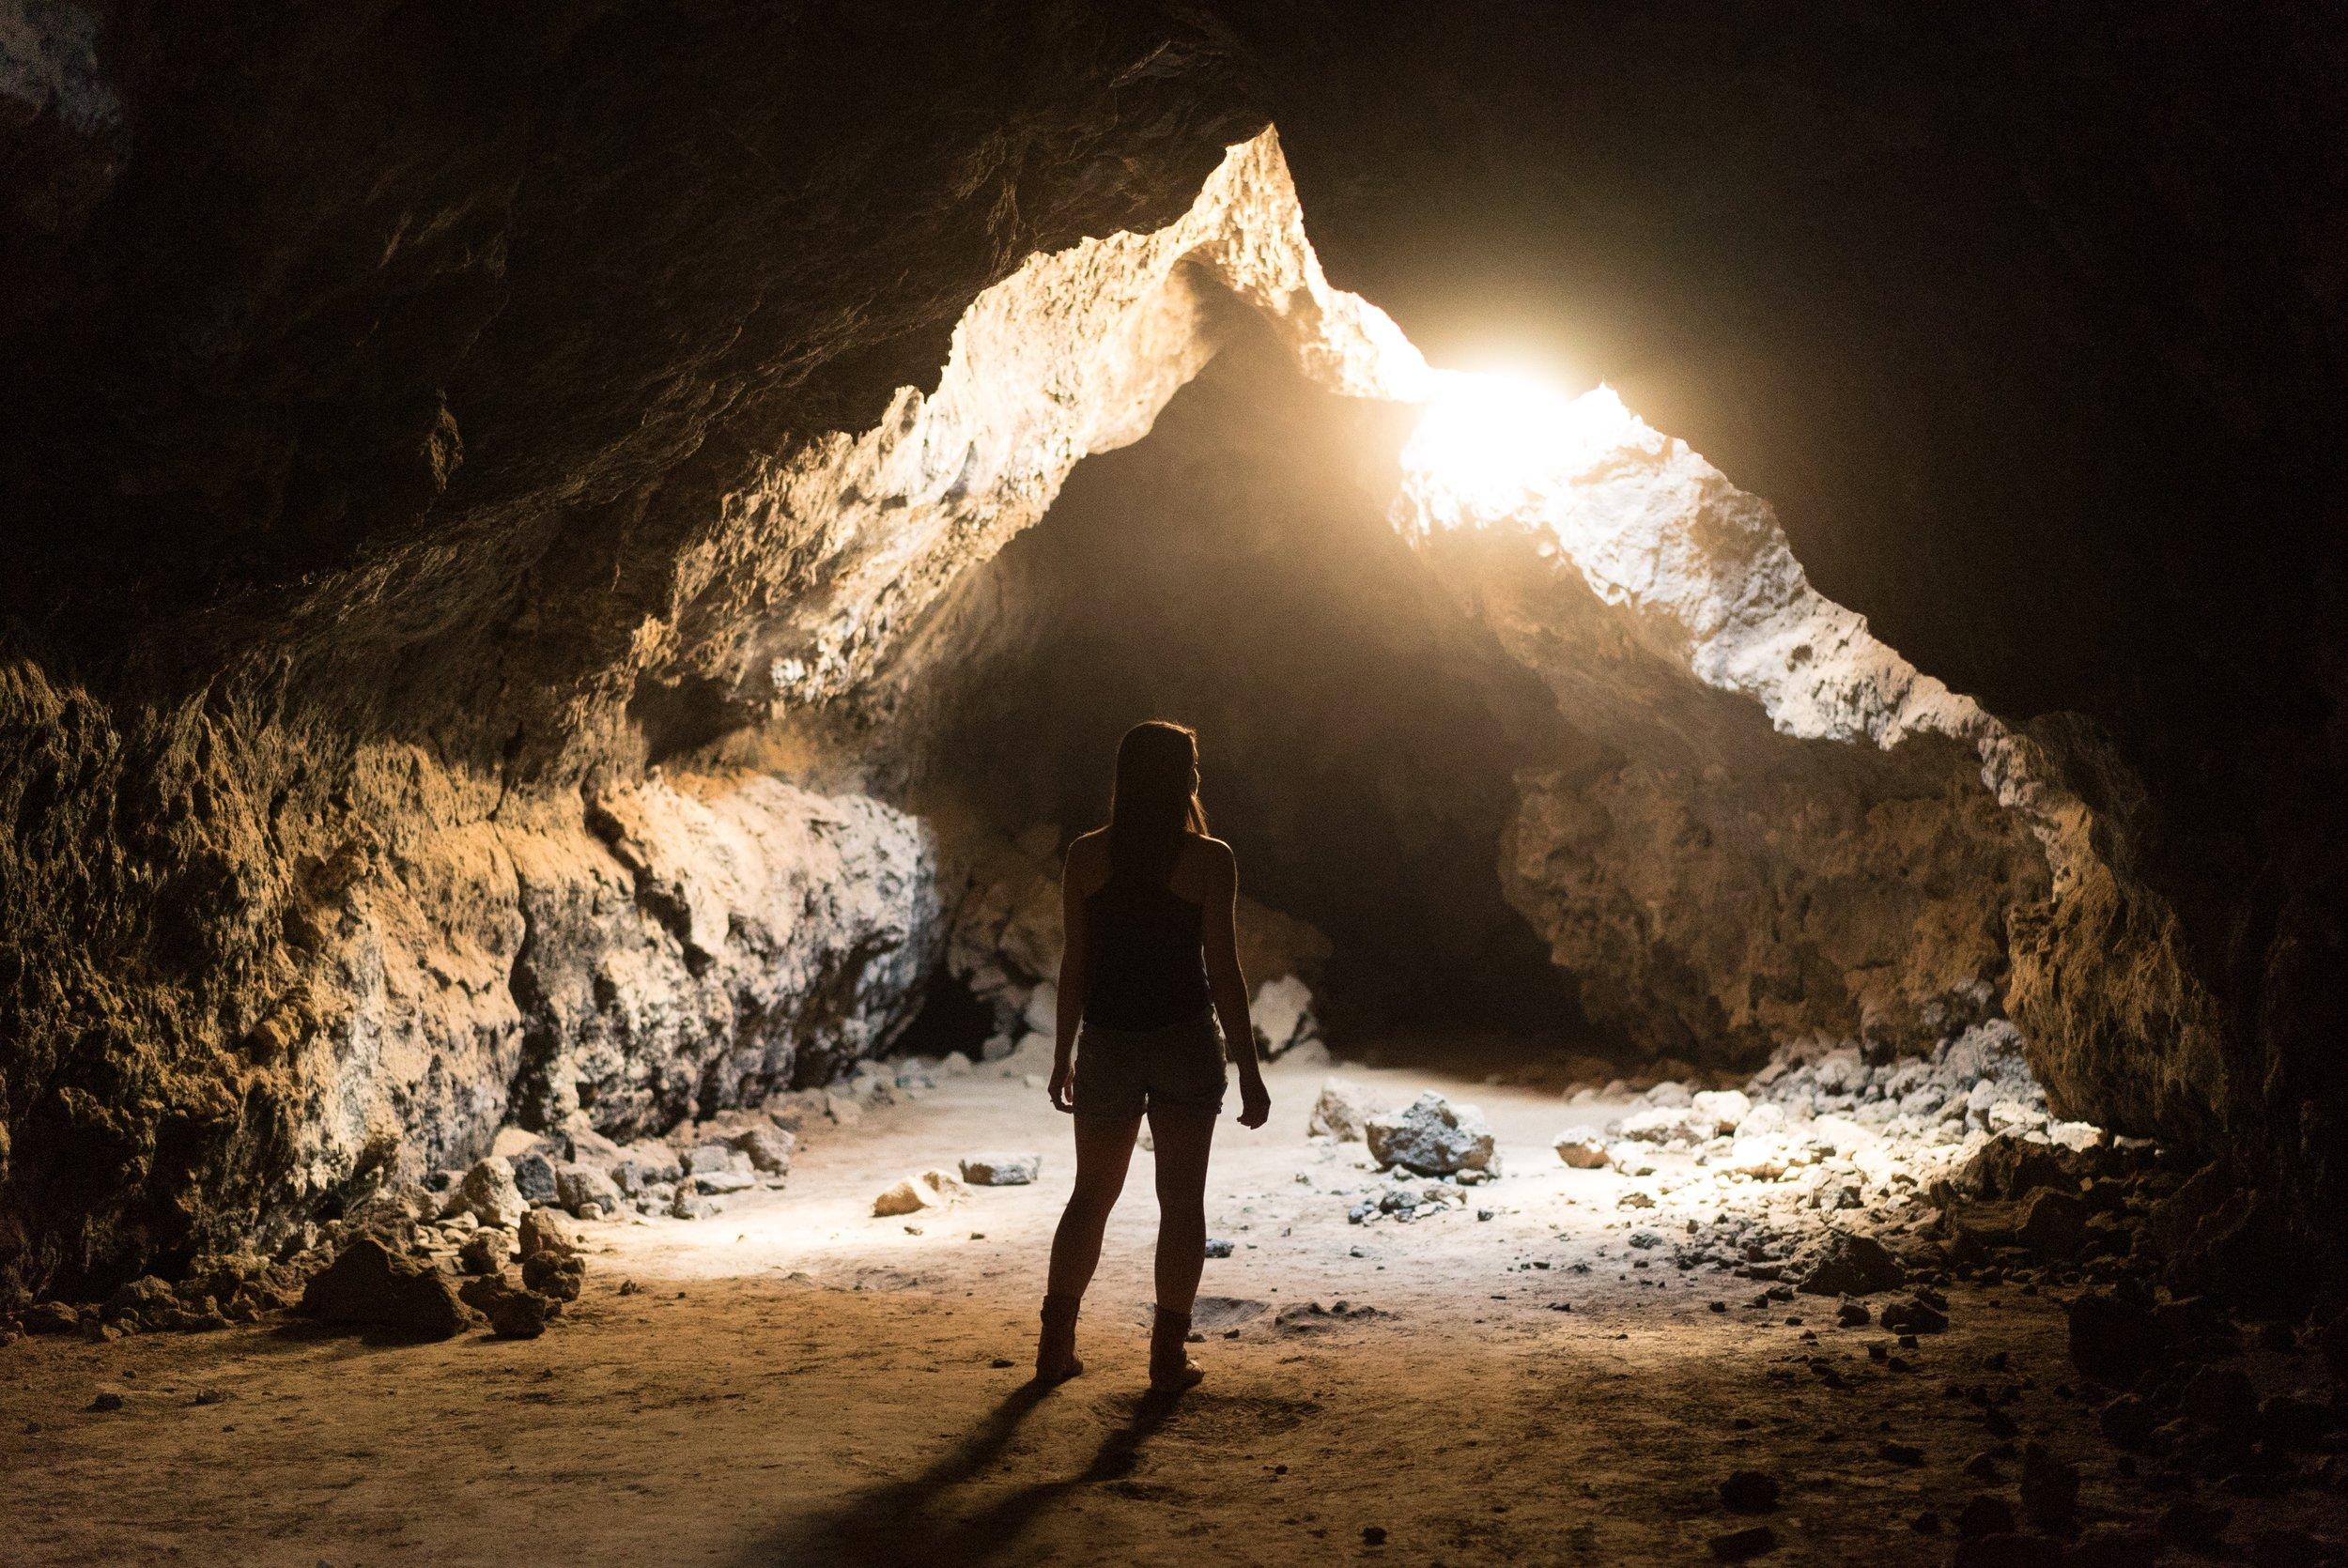 01_caves.jpg